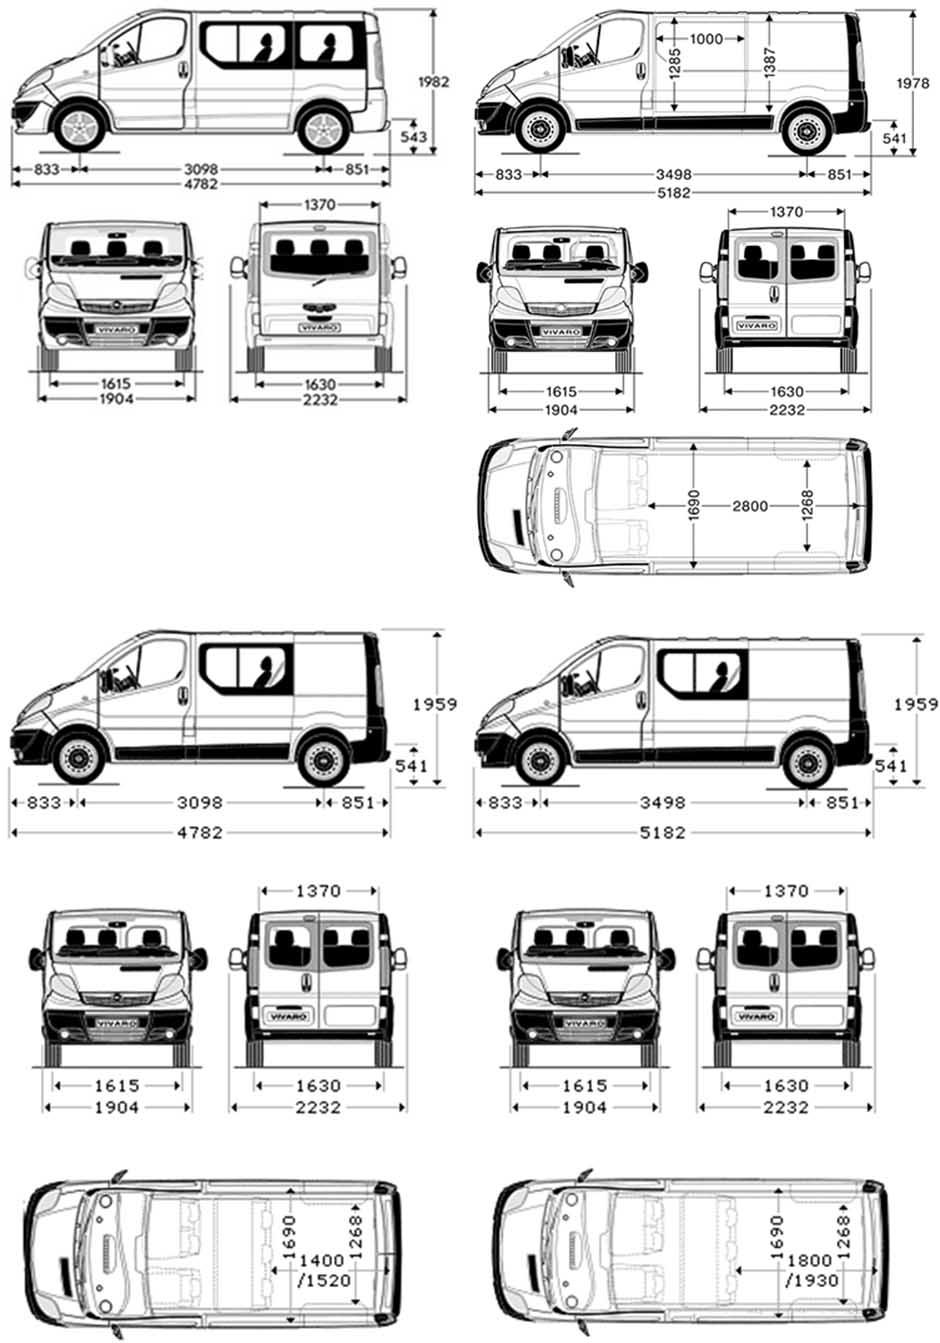 Dimensions Trafic Renault. renault trafic 2014 dimensions